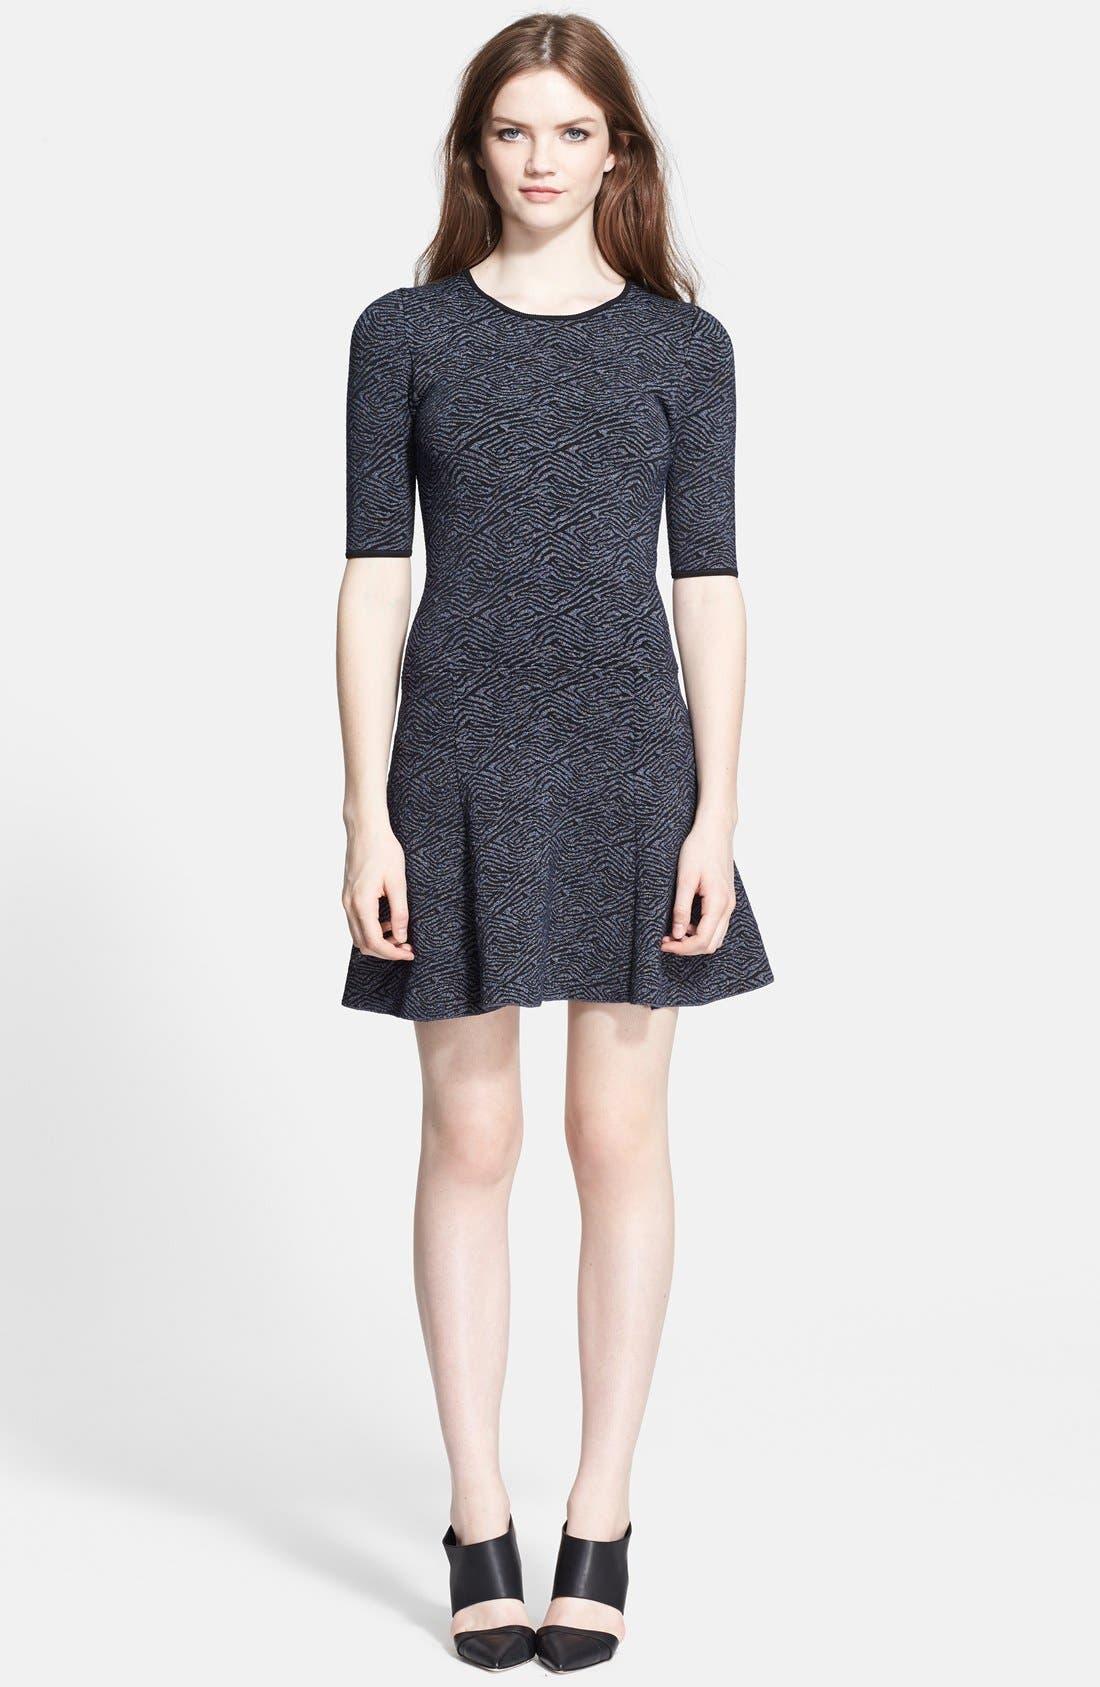 Main Image - A.L.C. 'Deele' Jacquard Knit Dress